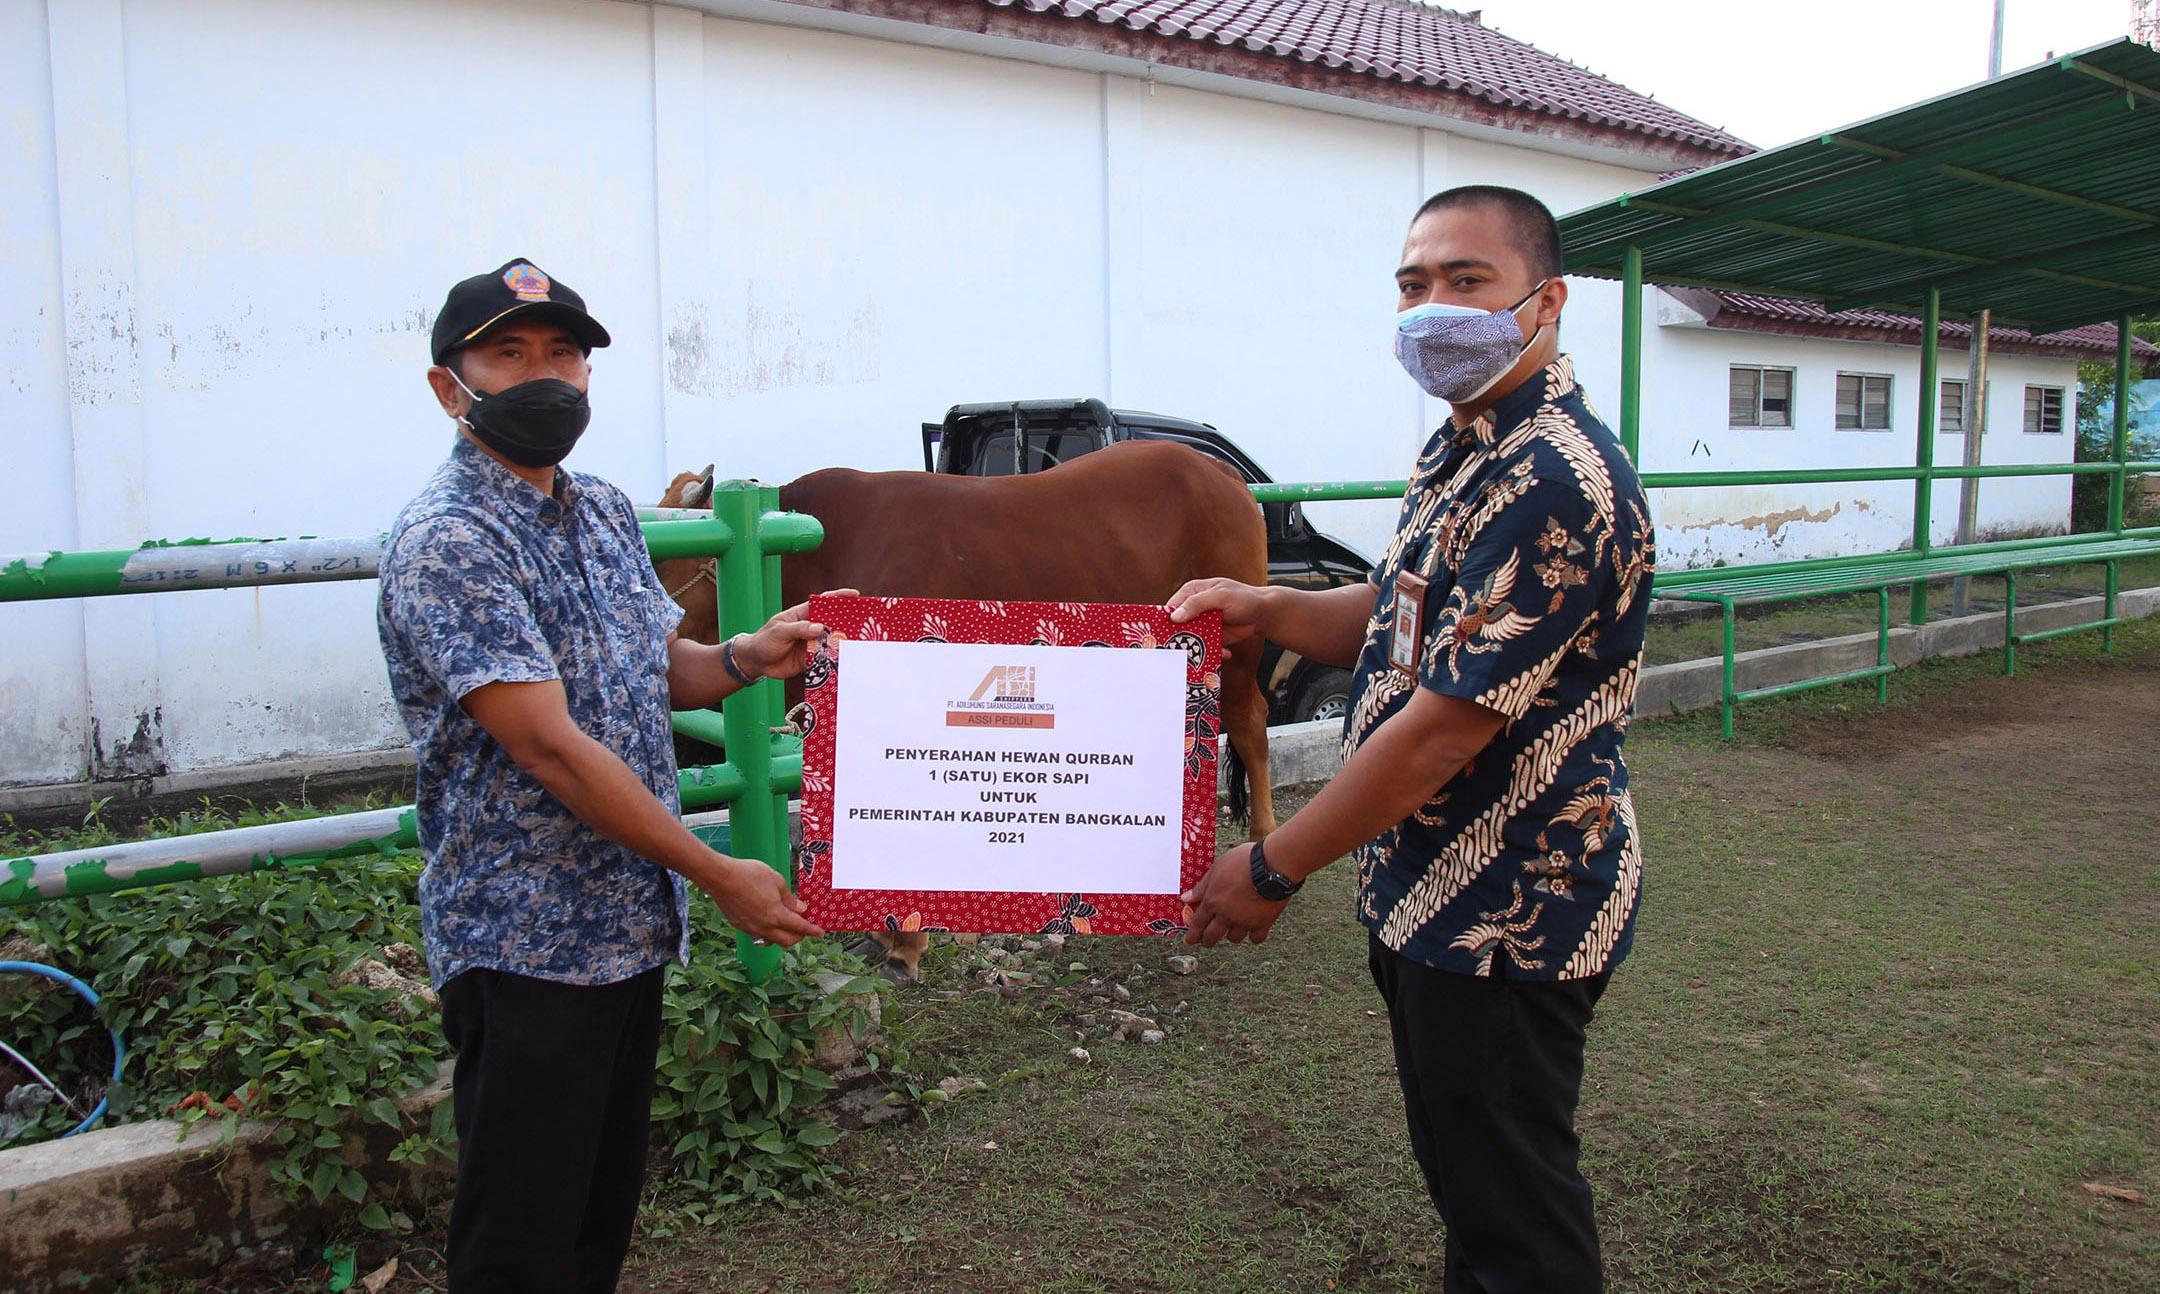 KELUARGA BESAR PT. ADILUHUNG SARANASEGARA INDONESIA MEMPERINGATI HARI RAYA IDUL ADHA 1442 H